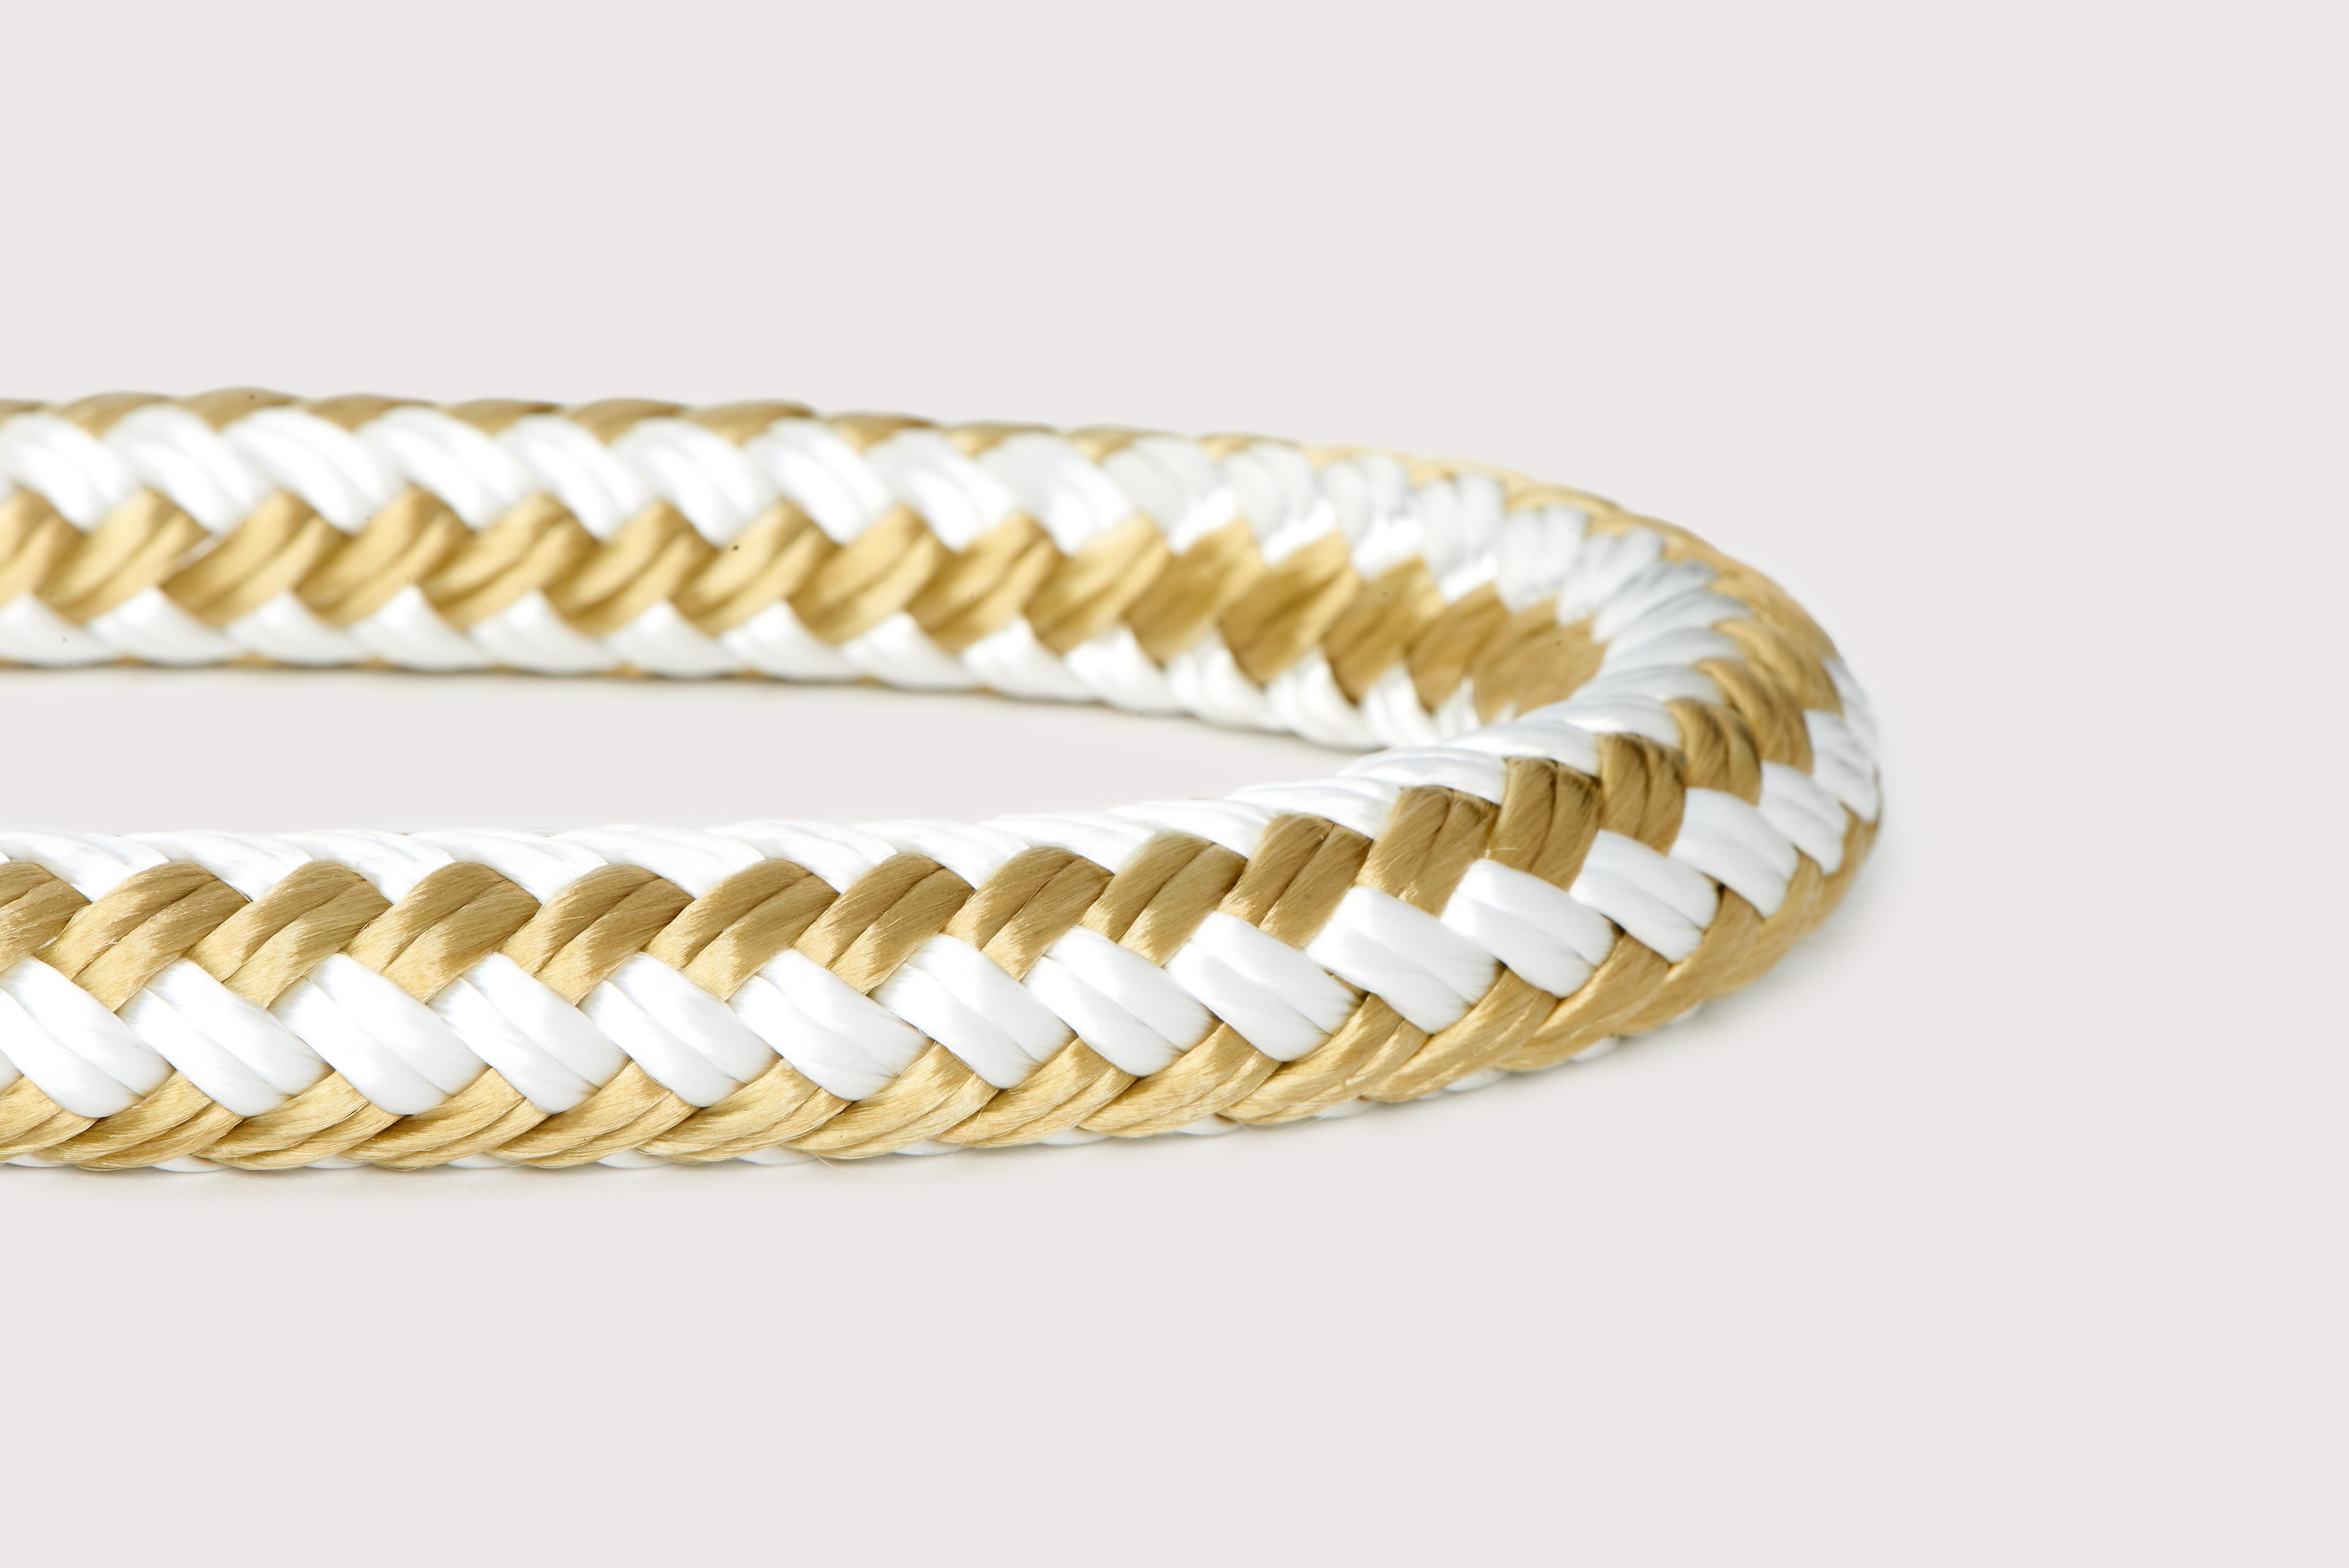 Orion-Cordage-Gold Braid Double Braid Nylon-Gold,White-Curved176.jpg